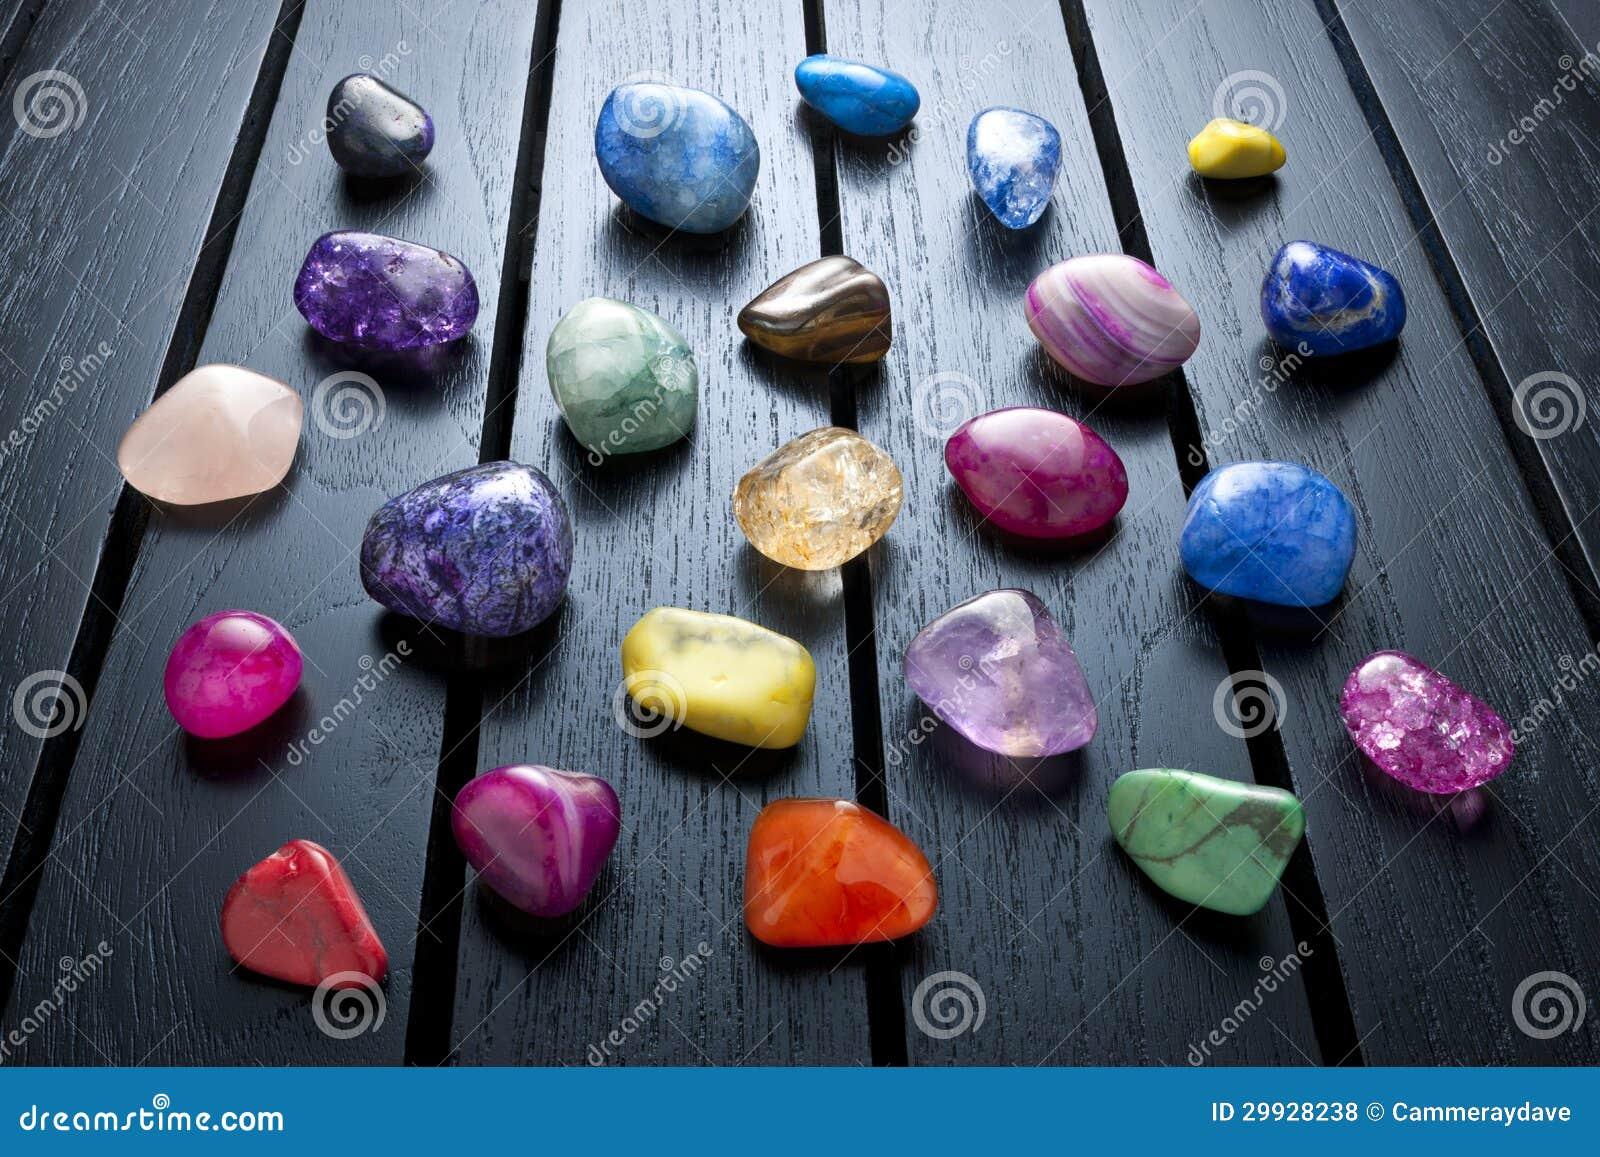 Crystals And Stones : Crystals gemstones healing rocks royalty free stock photos